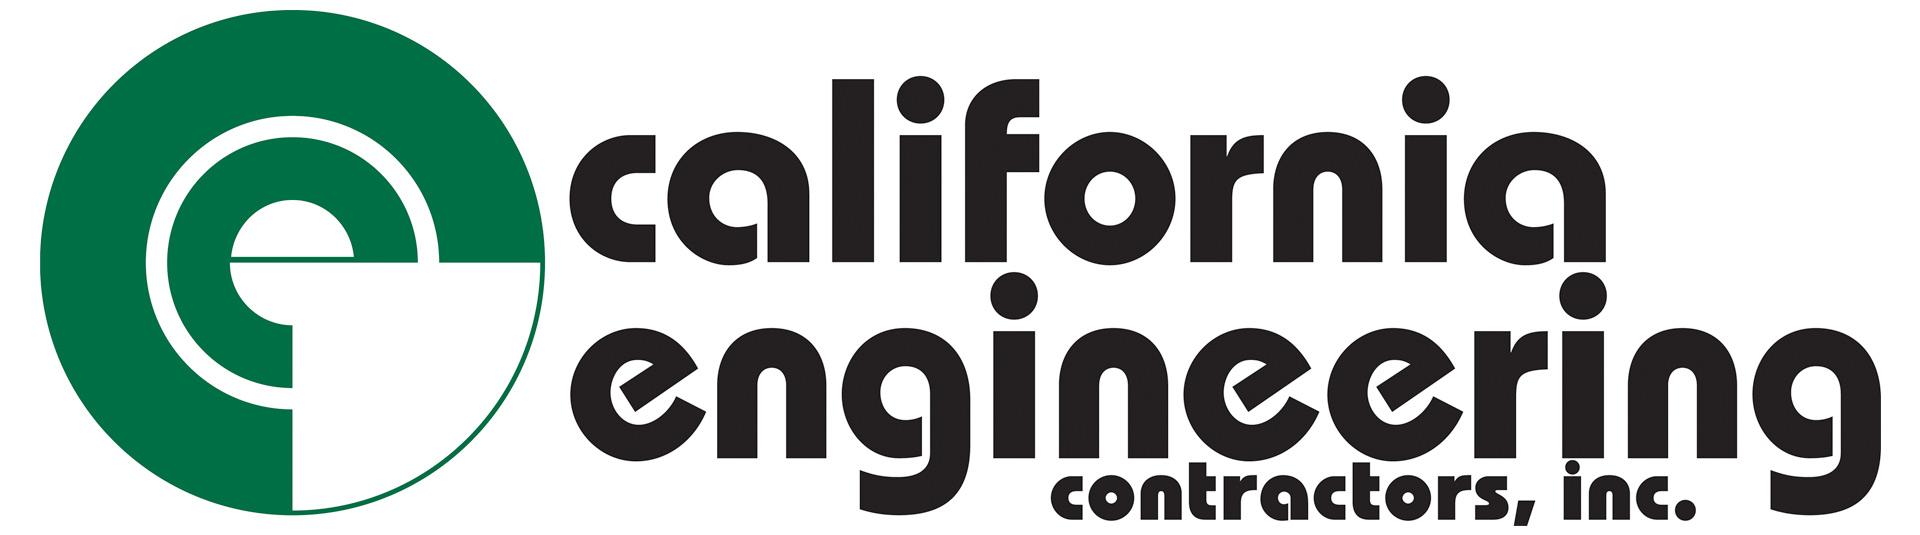 California Engineering Contractors